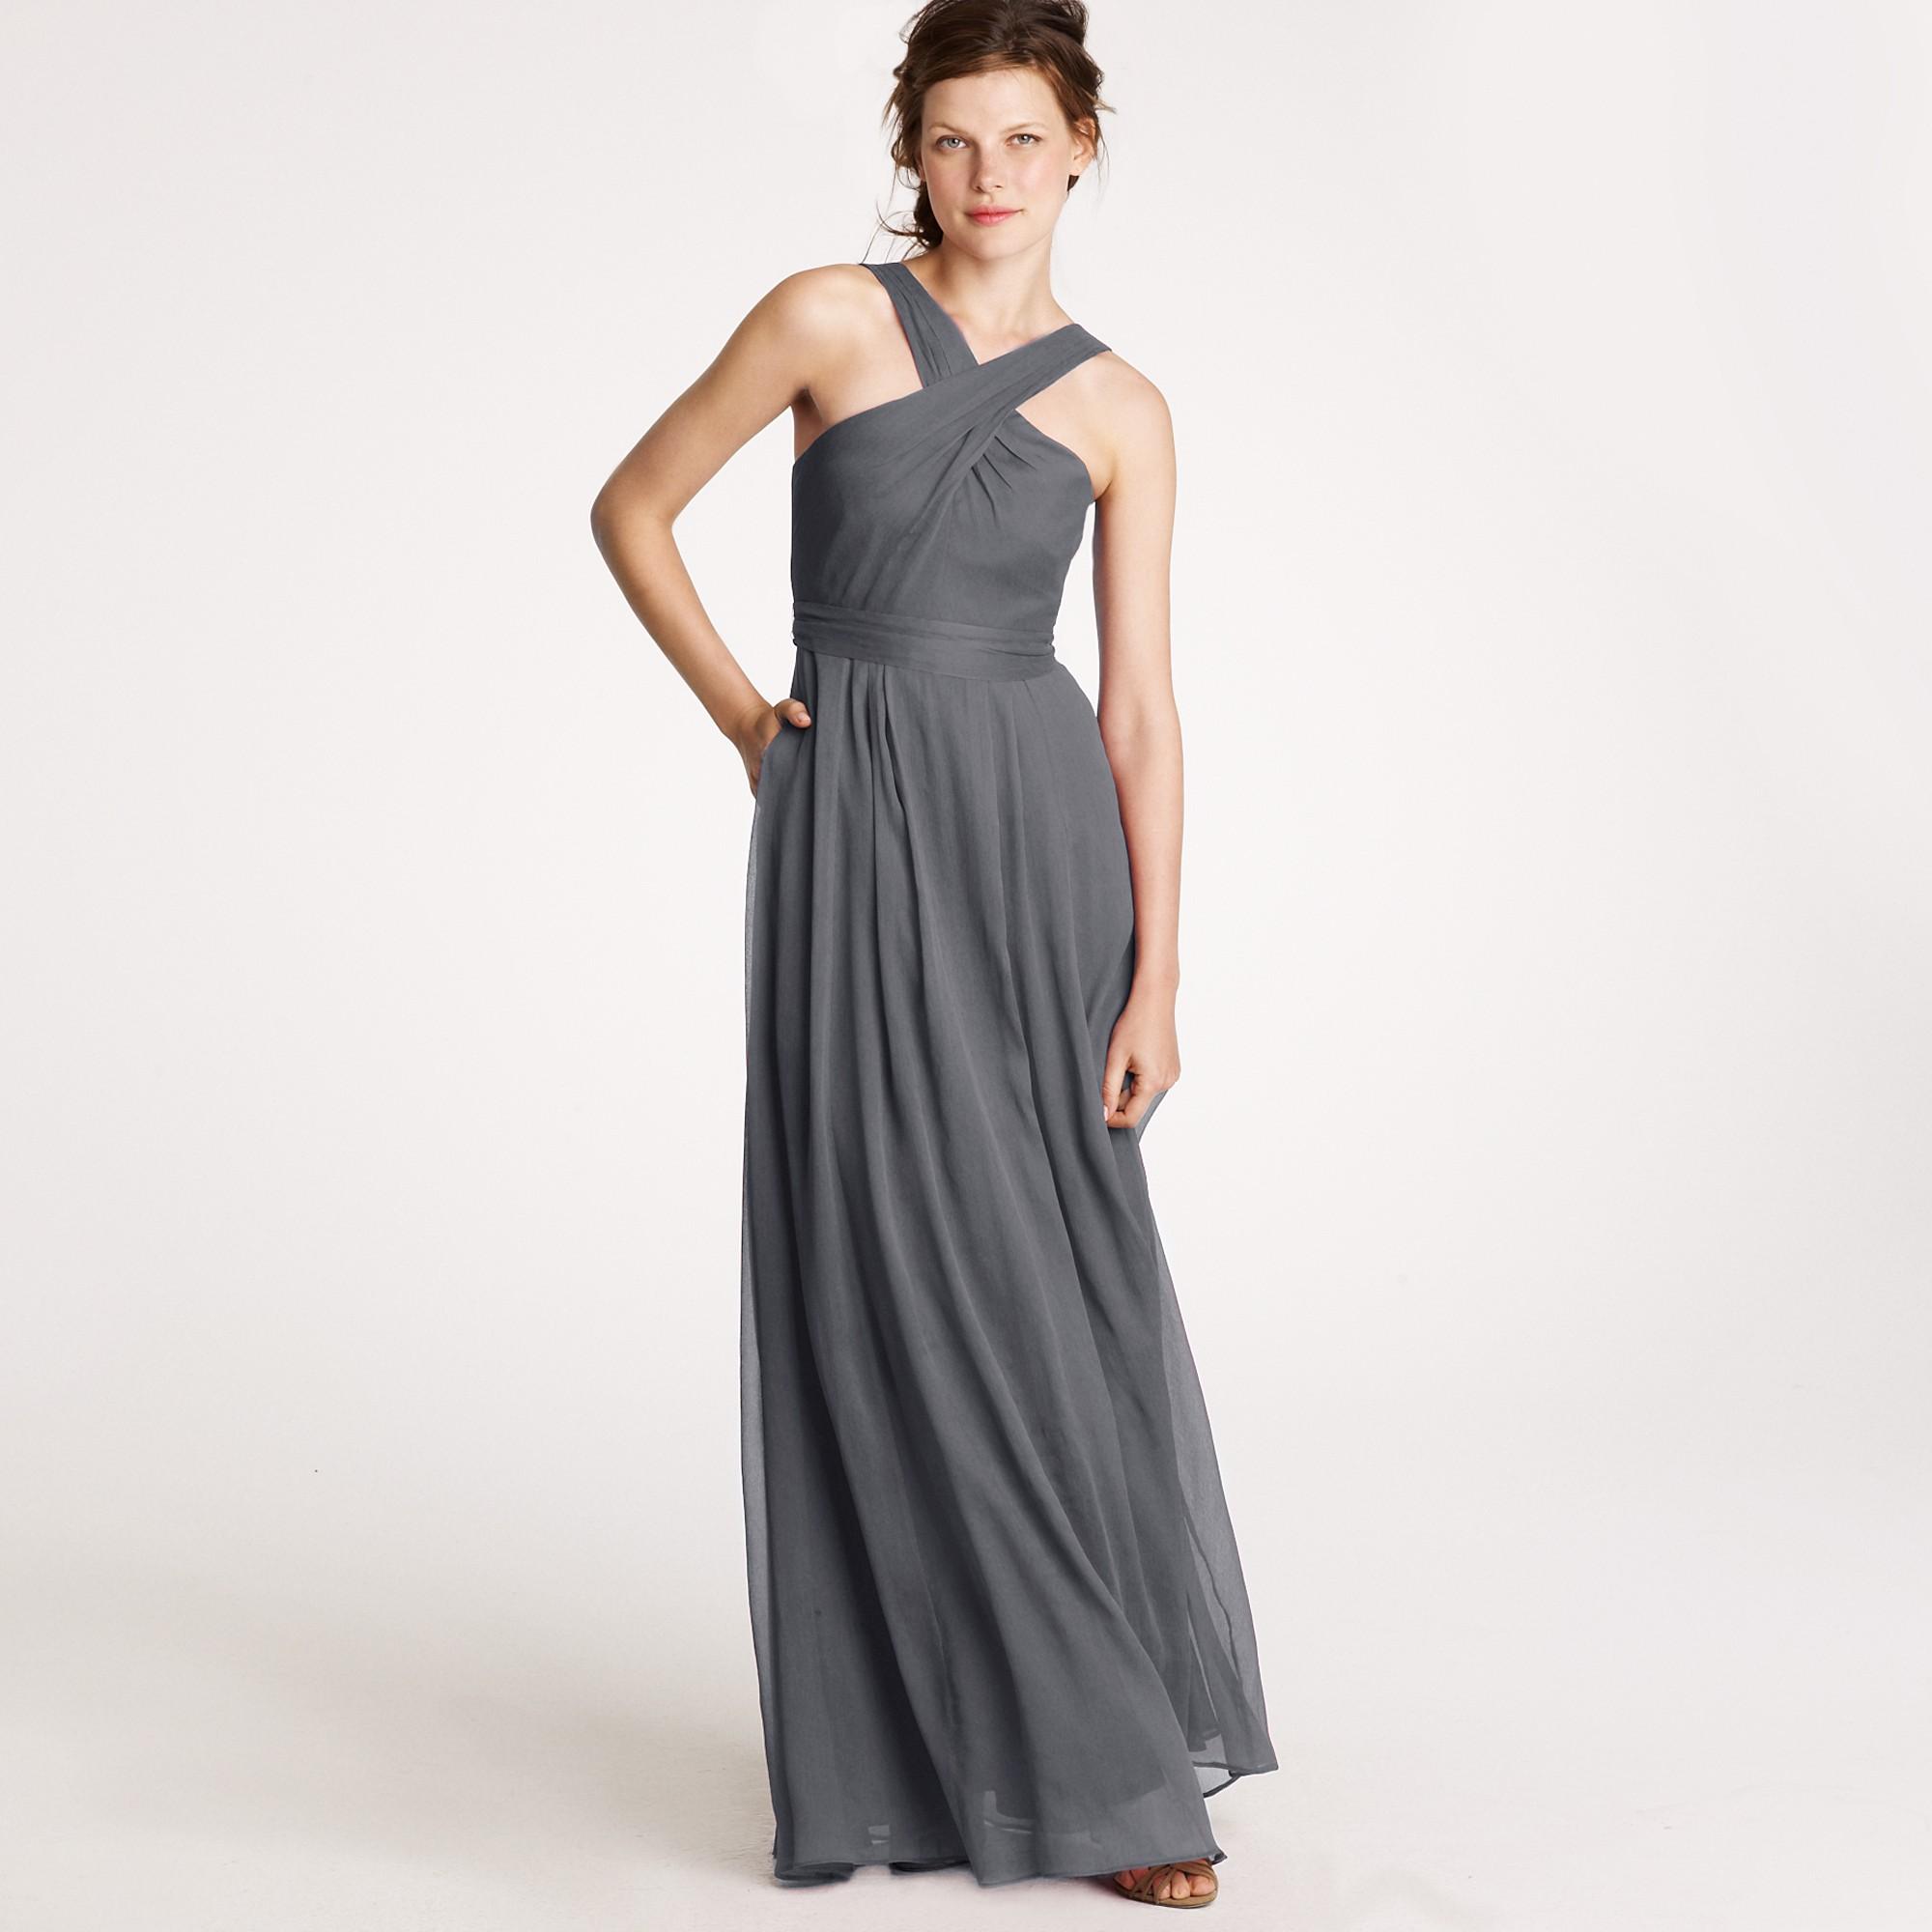 J.Crew Claudia Halter Dress In Silk Chiffon